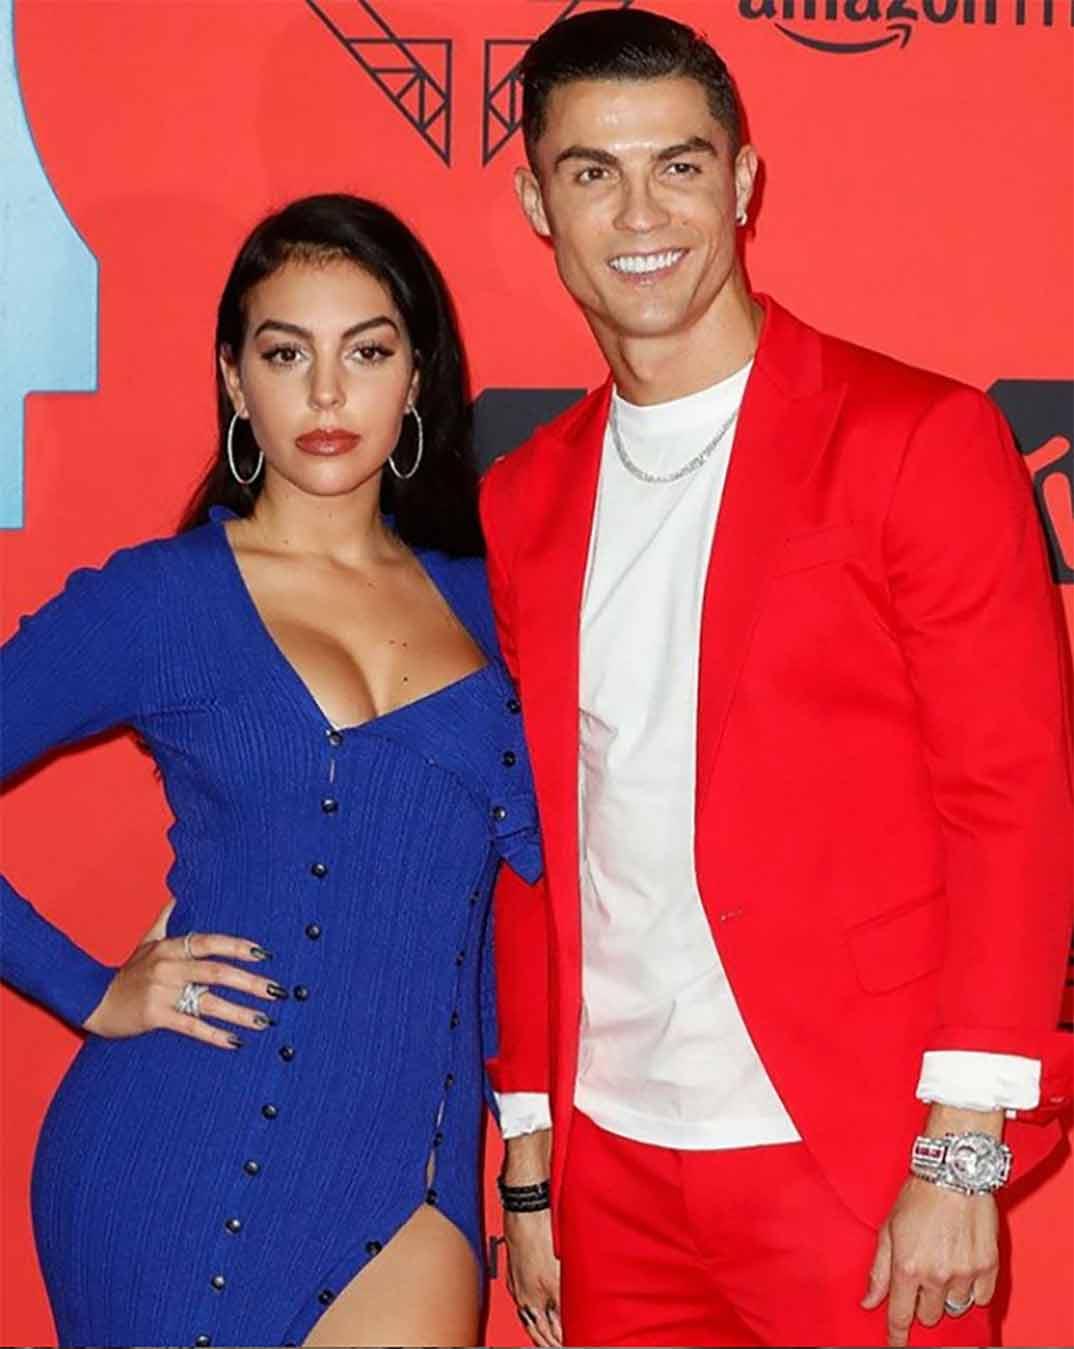 Georgina Rodríguez y Cristiano Ronaldo © Instagram